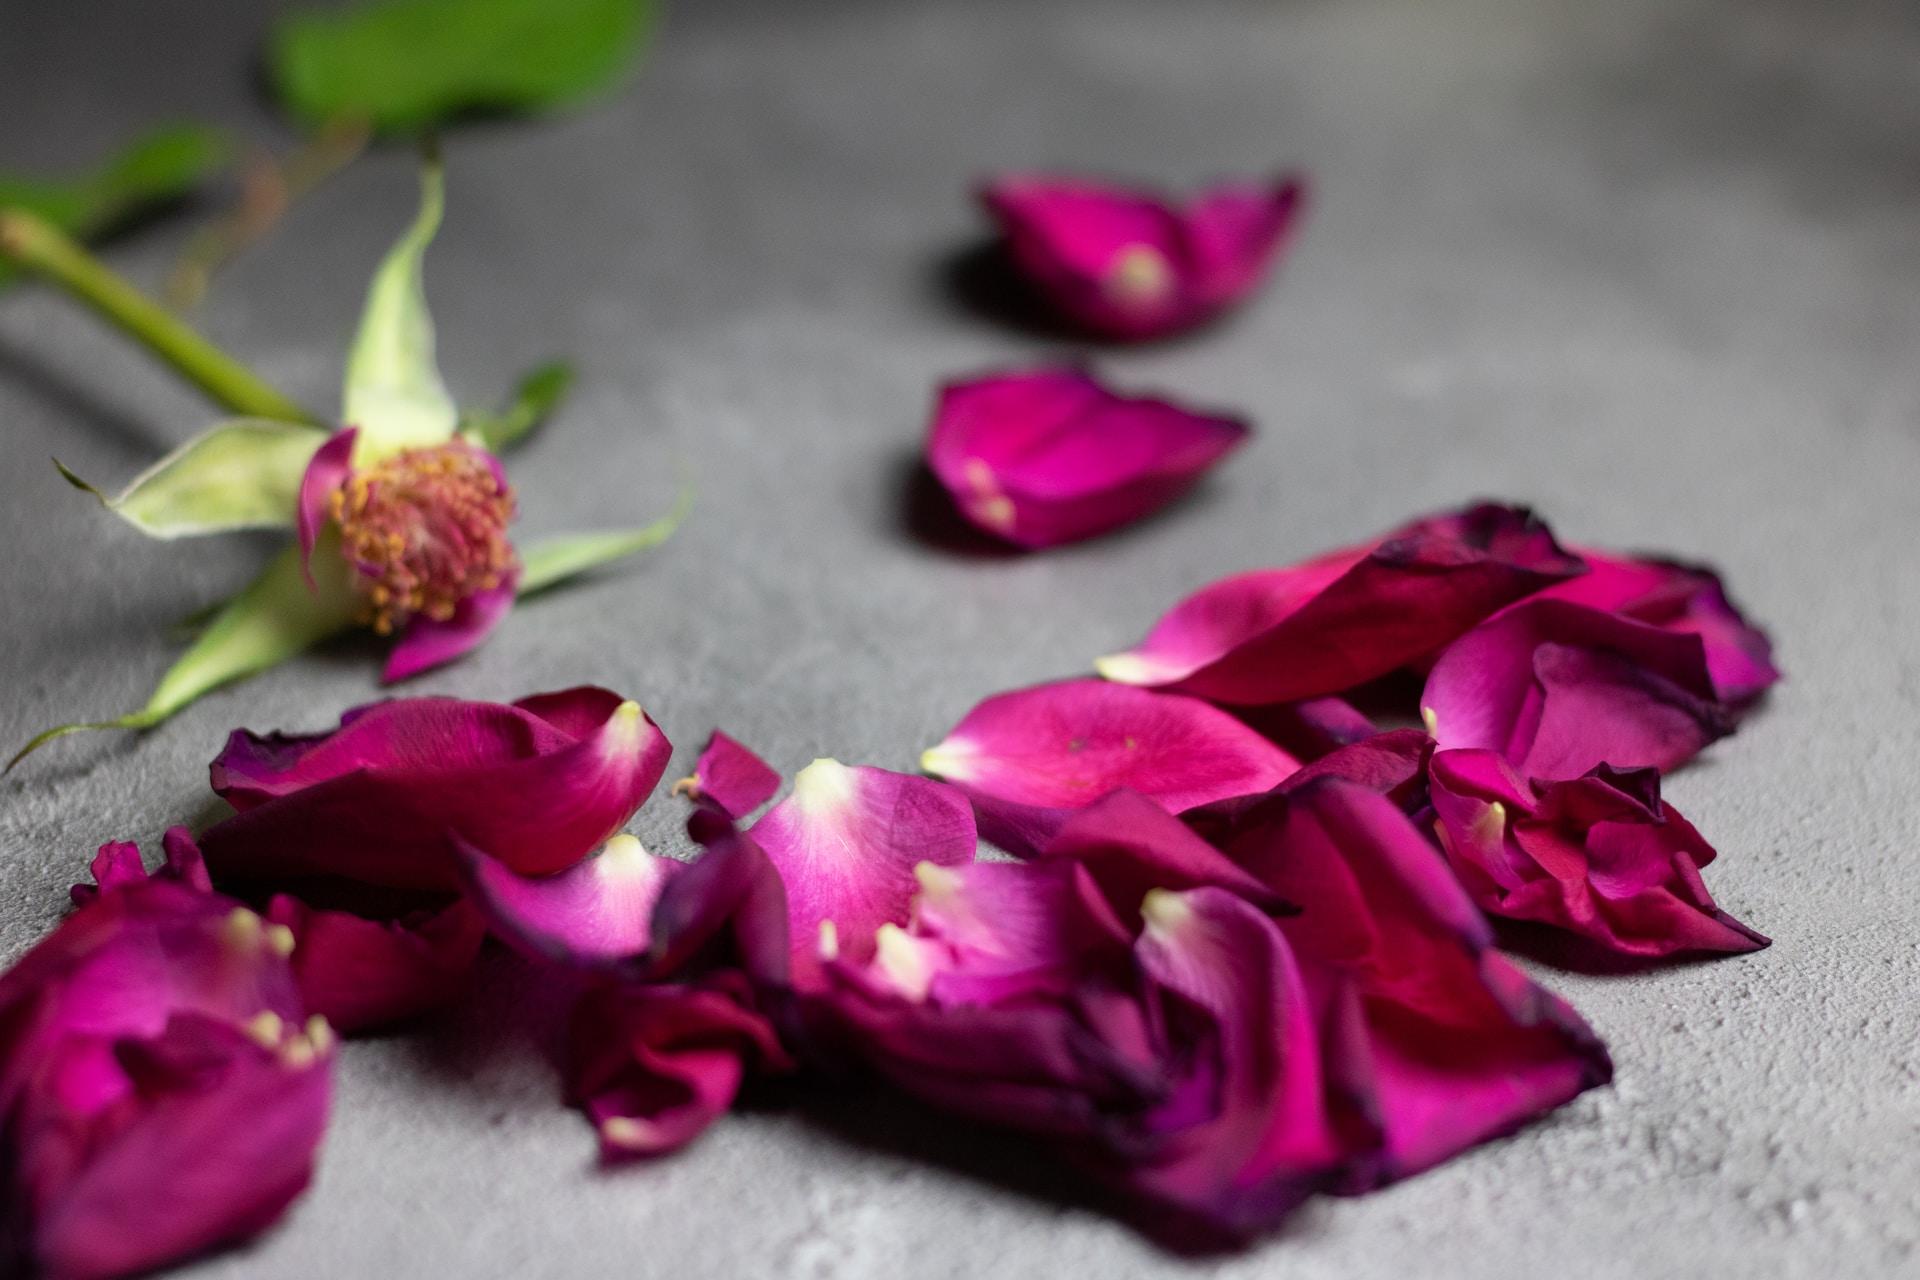 purple rose petals